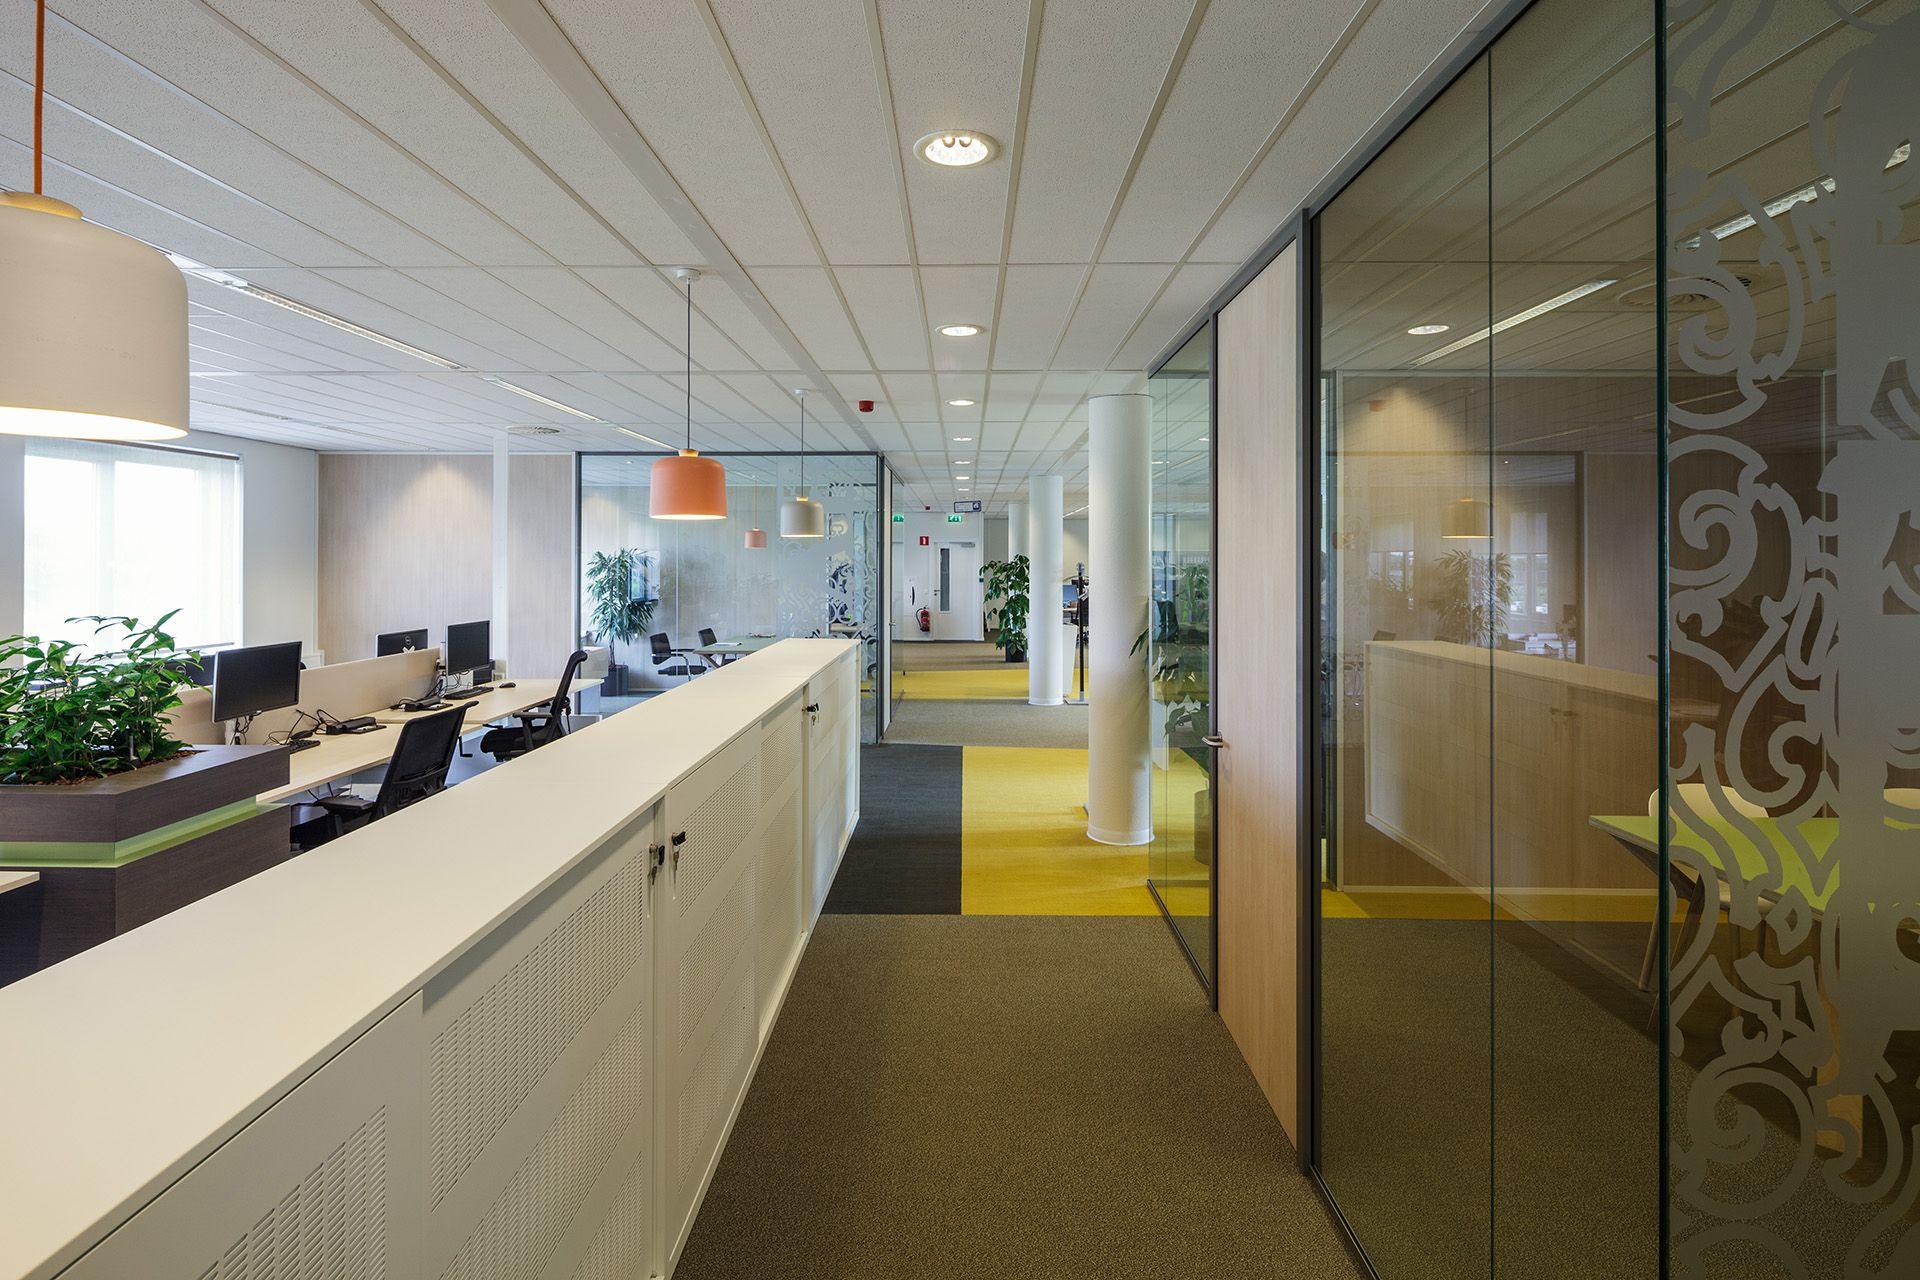 architect interieur kantoor intraffic nieuwegein studiosk movares 6 ...